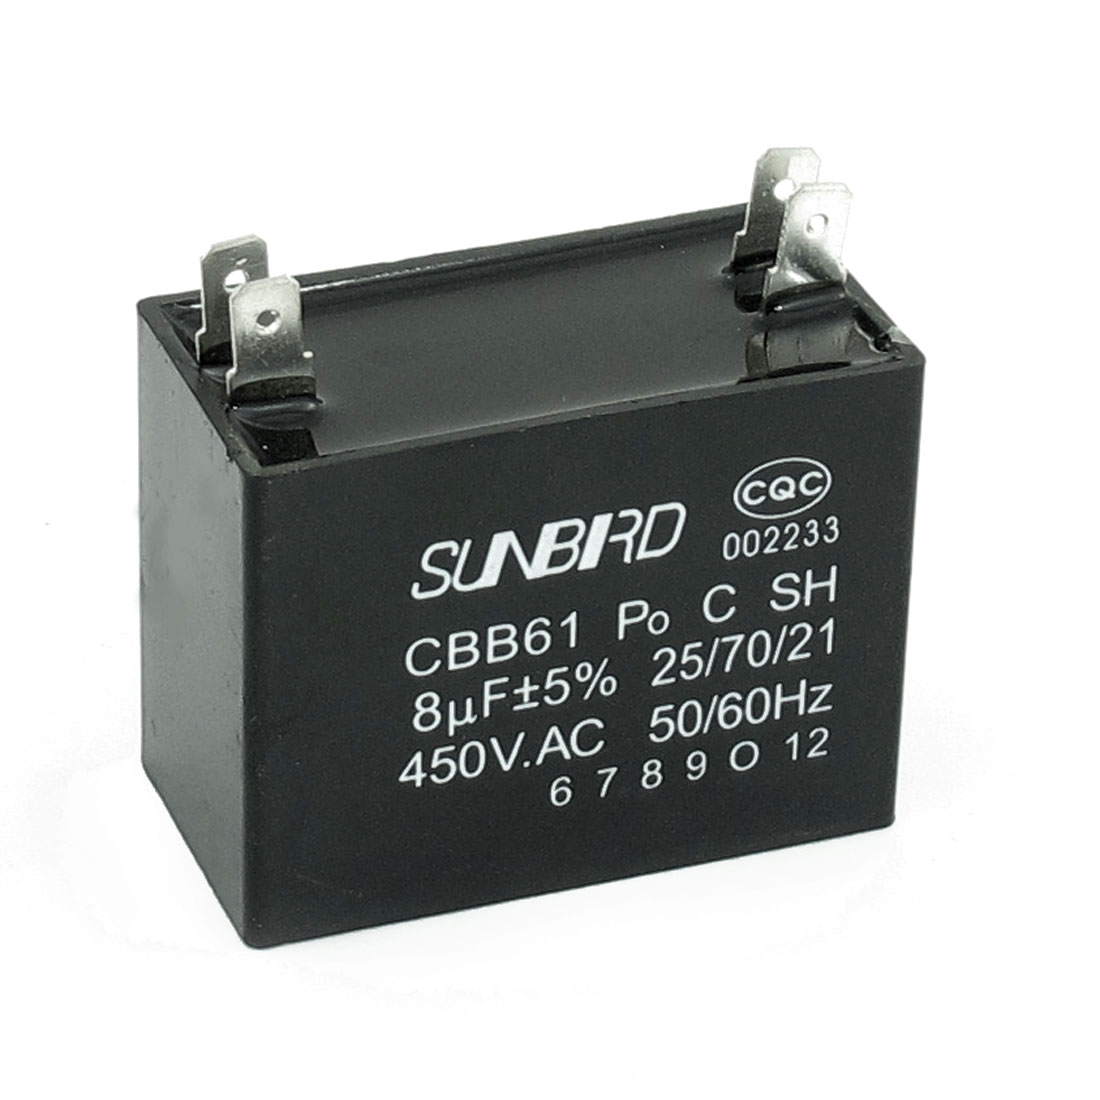 CBB61 8uF 5% 450V AC Polypropylene Film 4 Pin Terminals Motor Capacitor